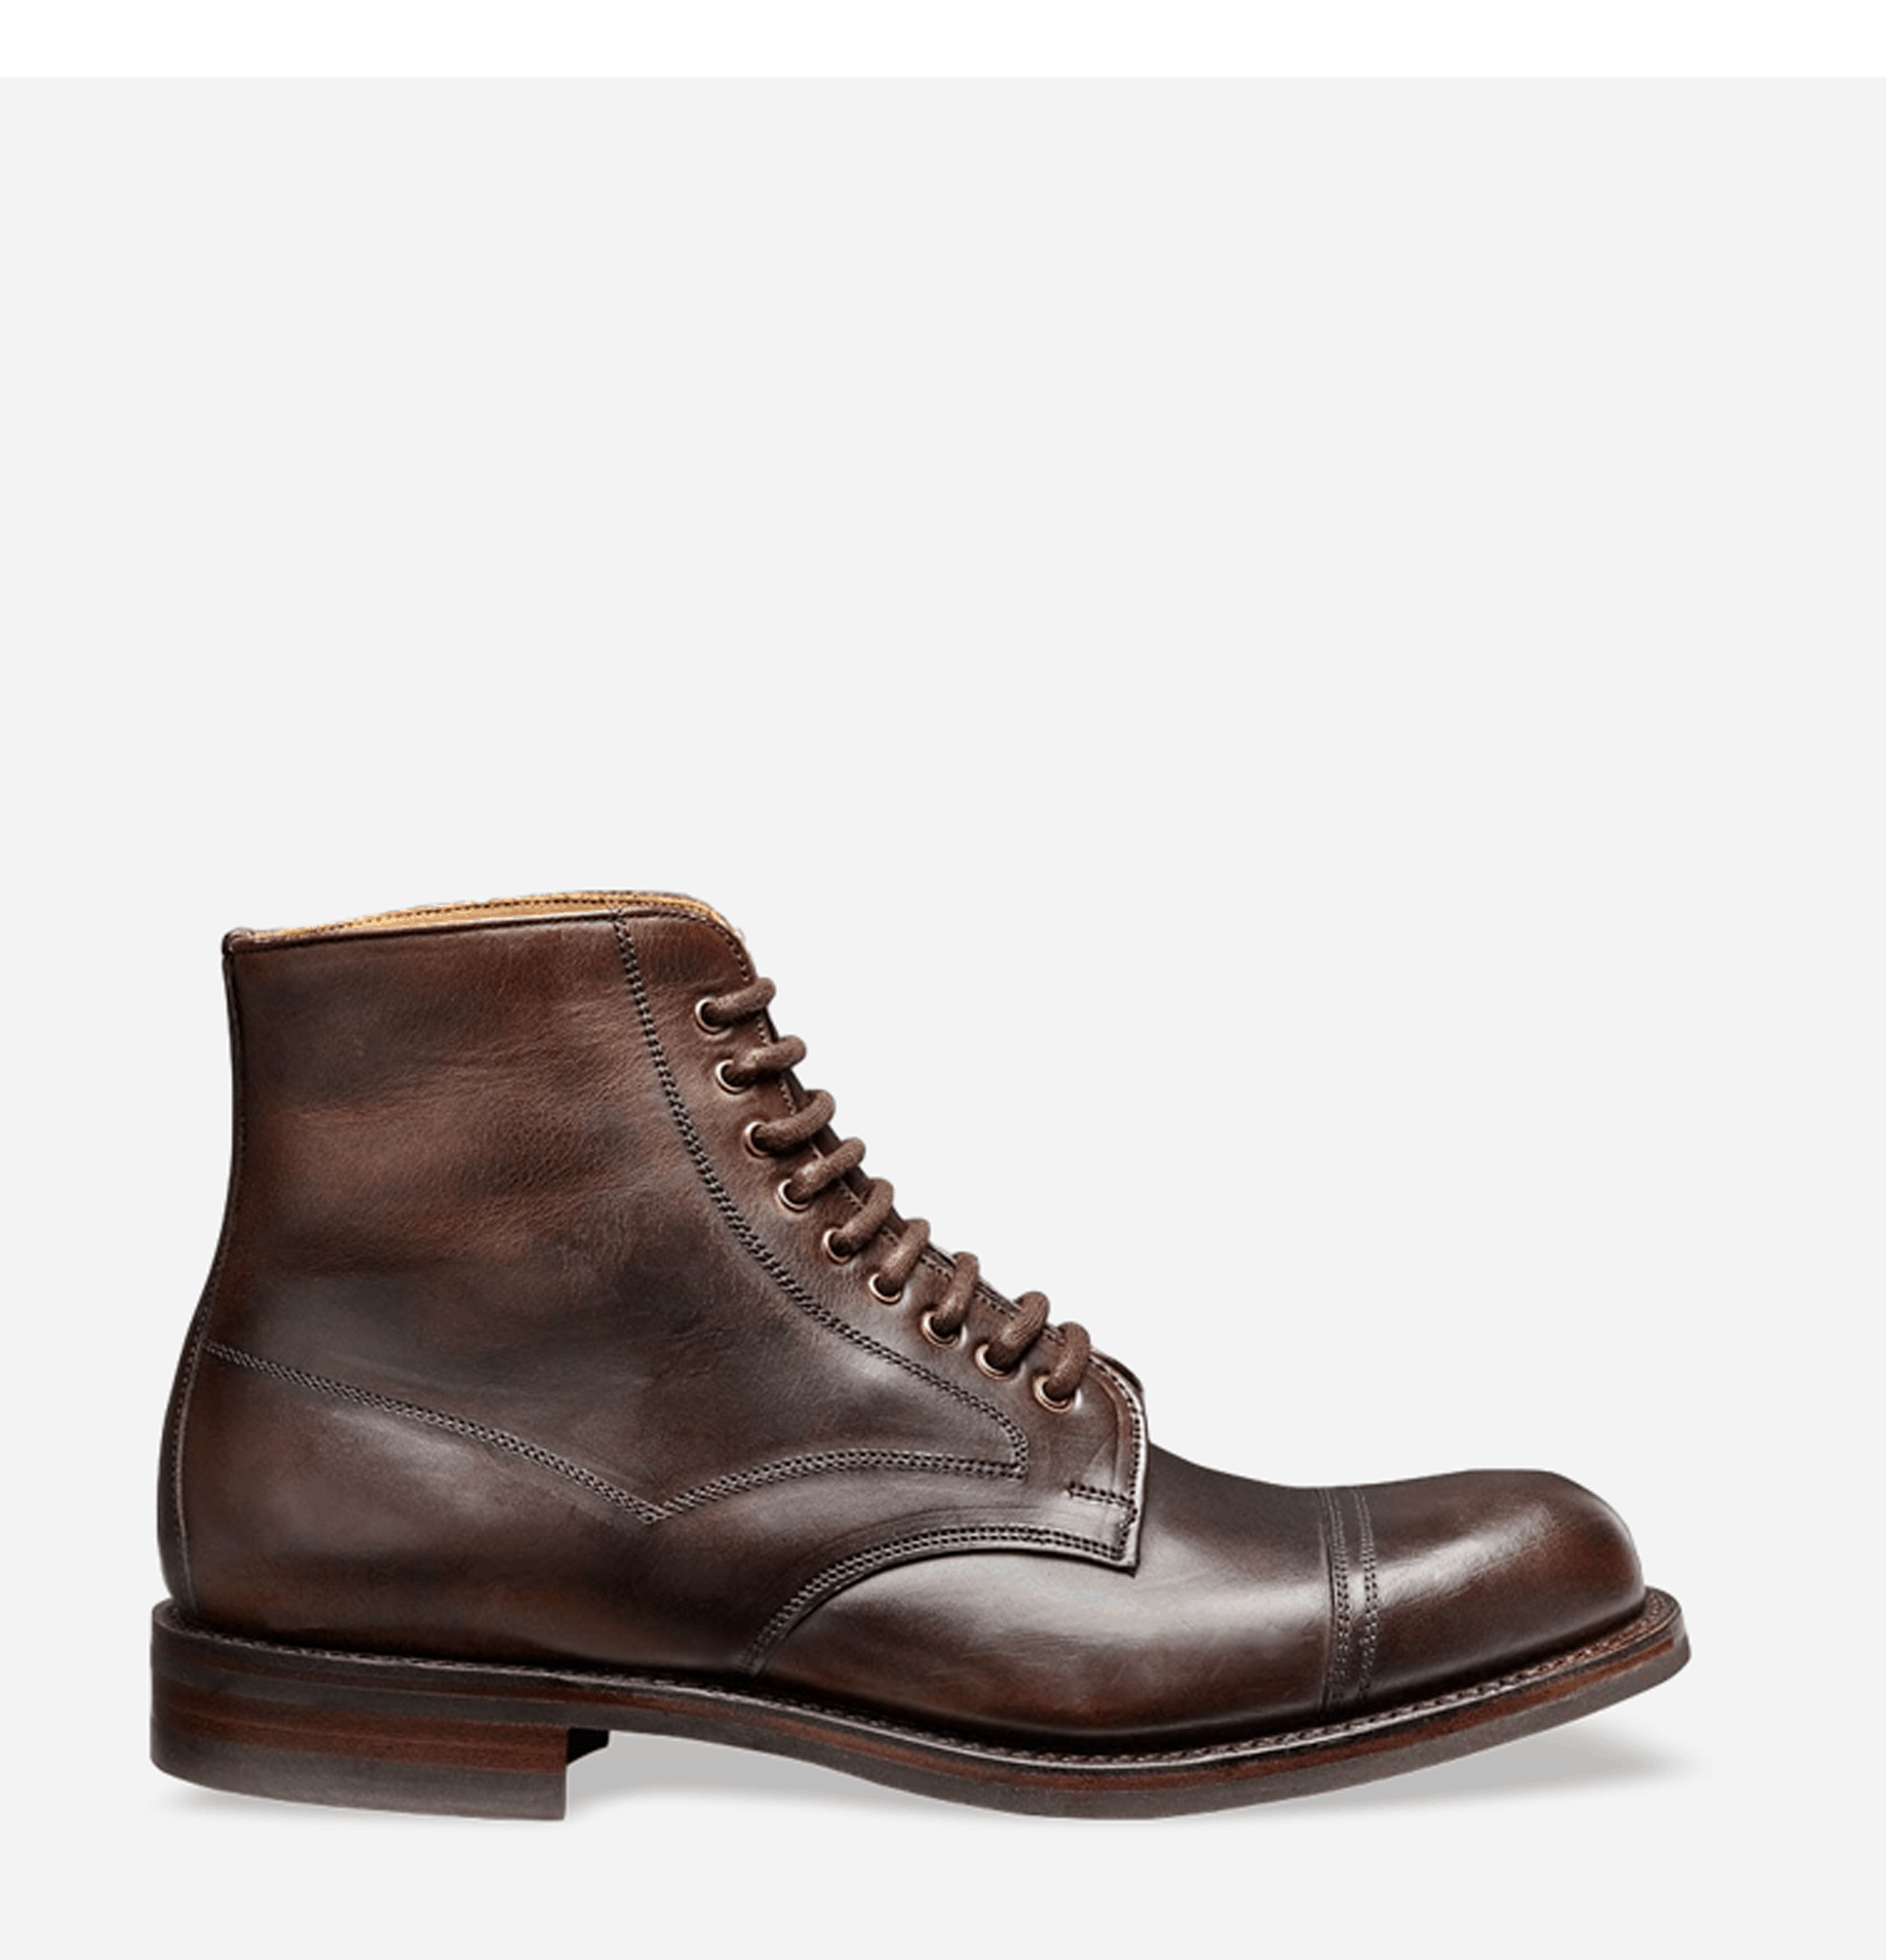 Jarrow Derby Boots Chicago Tan